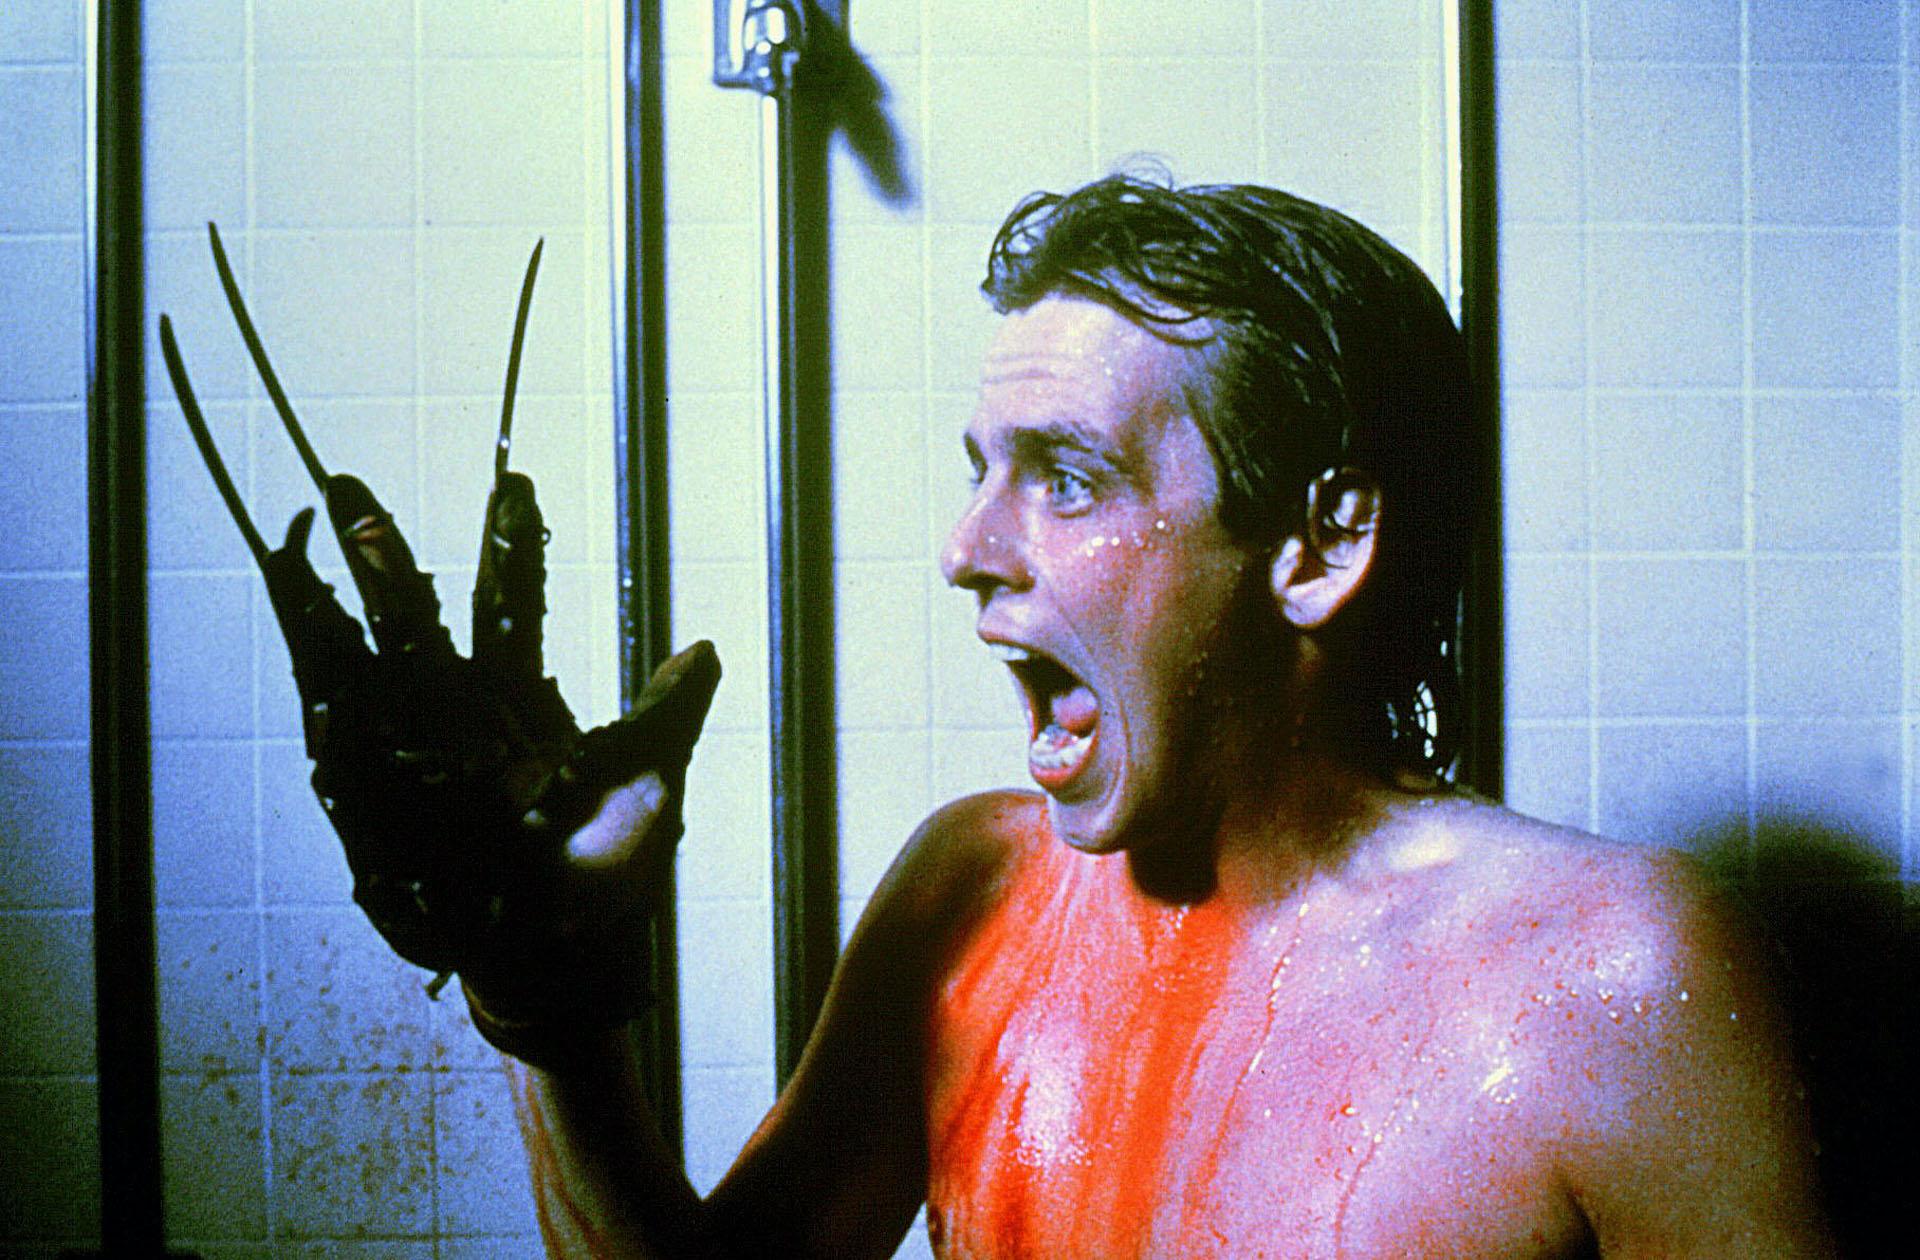 A Nightmare on Elm Street Part 2